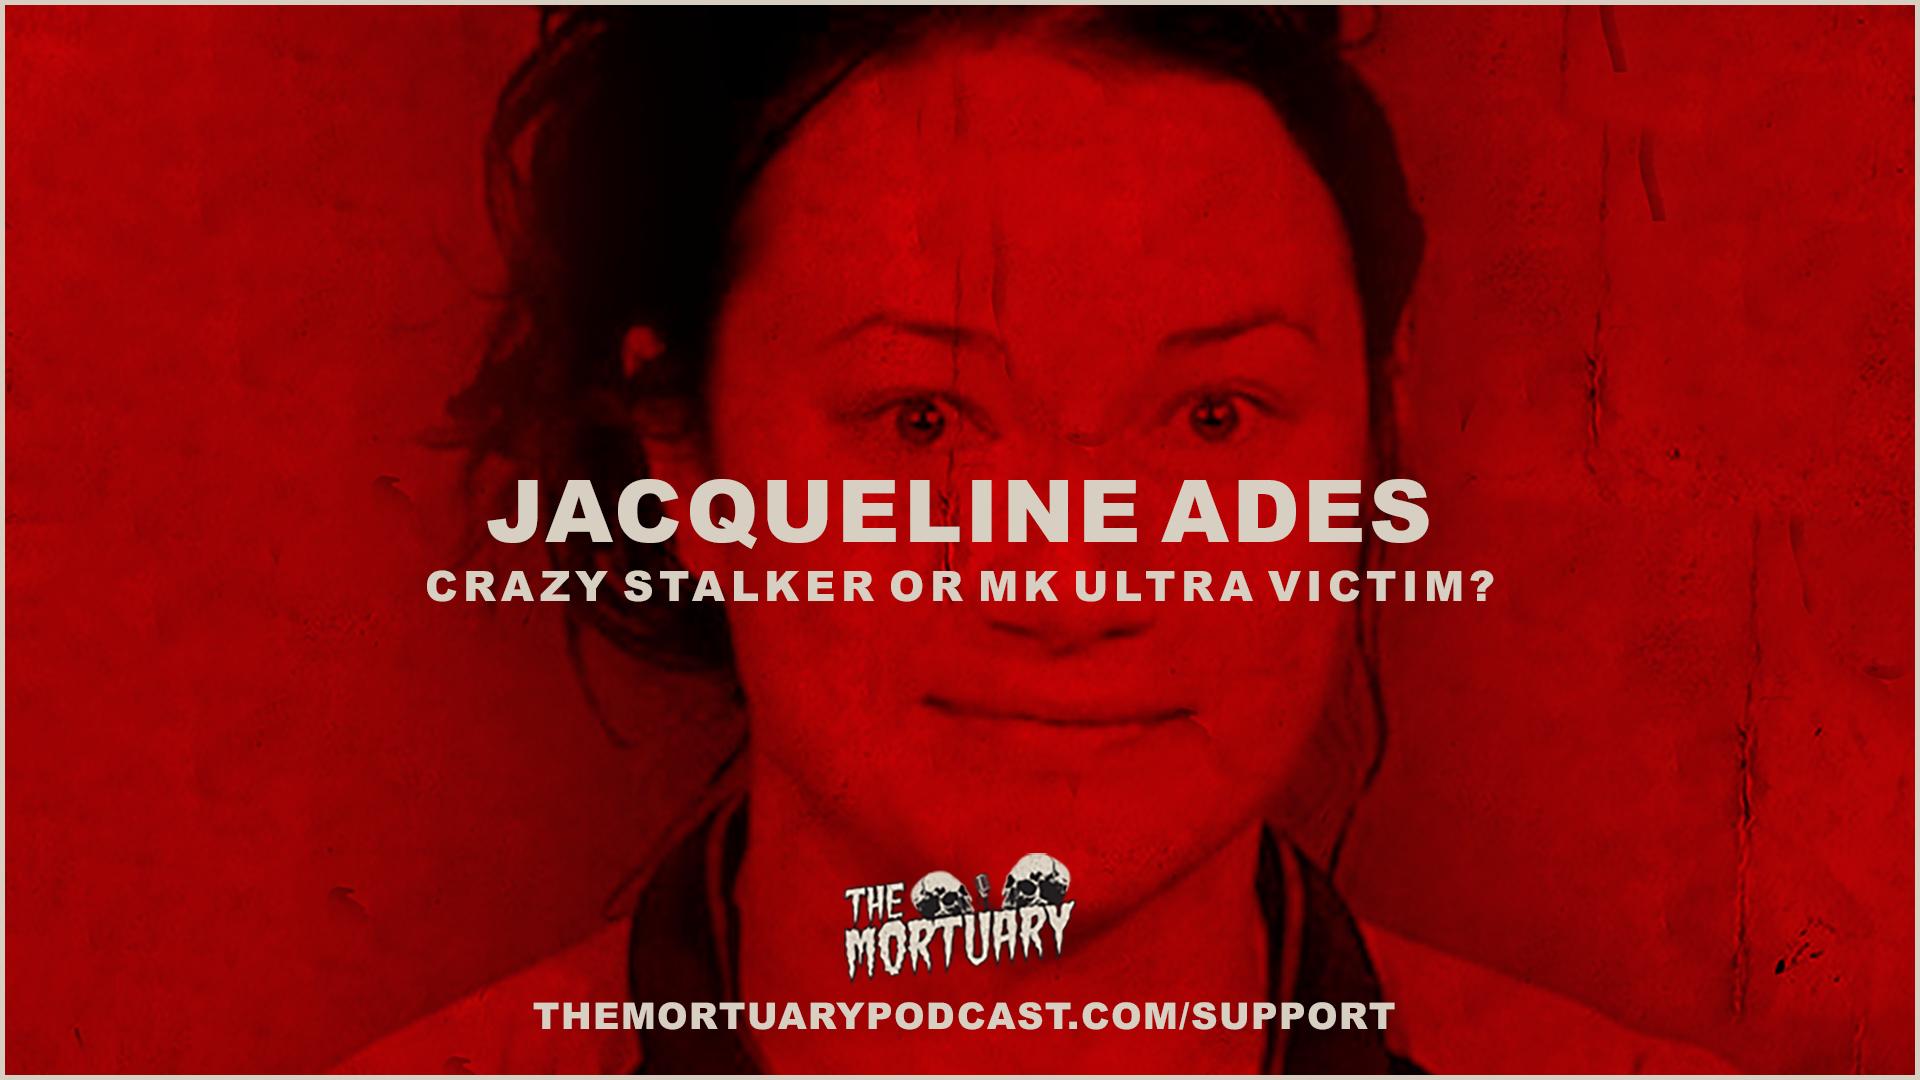 Jacqueline Ades MK Ultra